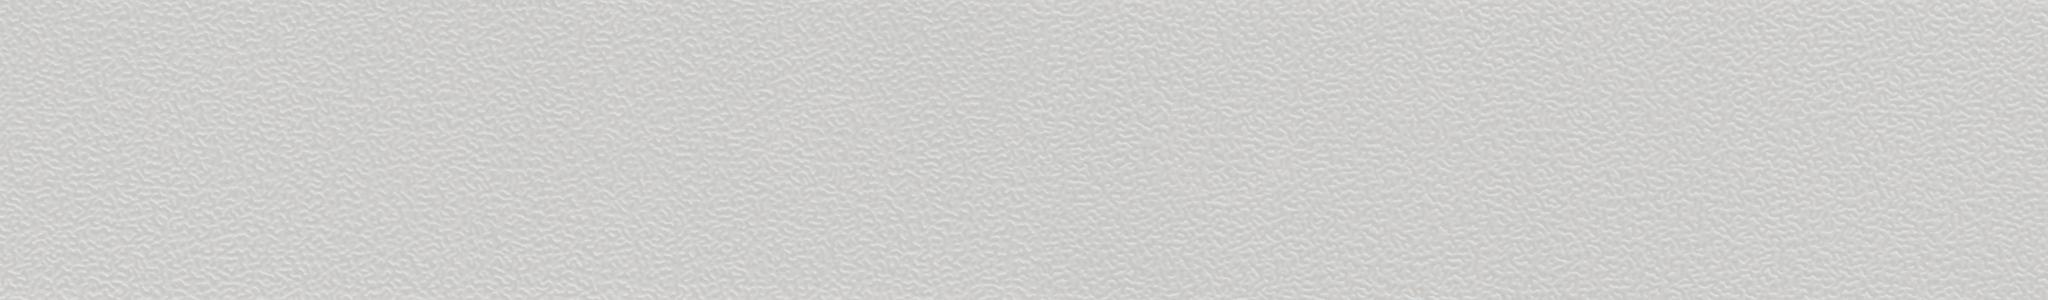 HU 170540 кромка ABS серая жемчуг 101